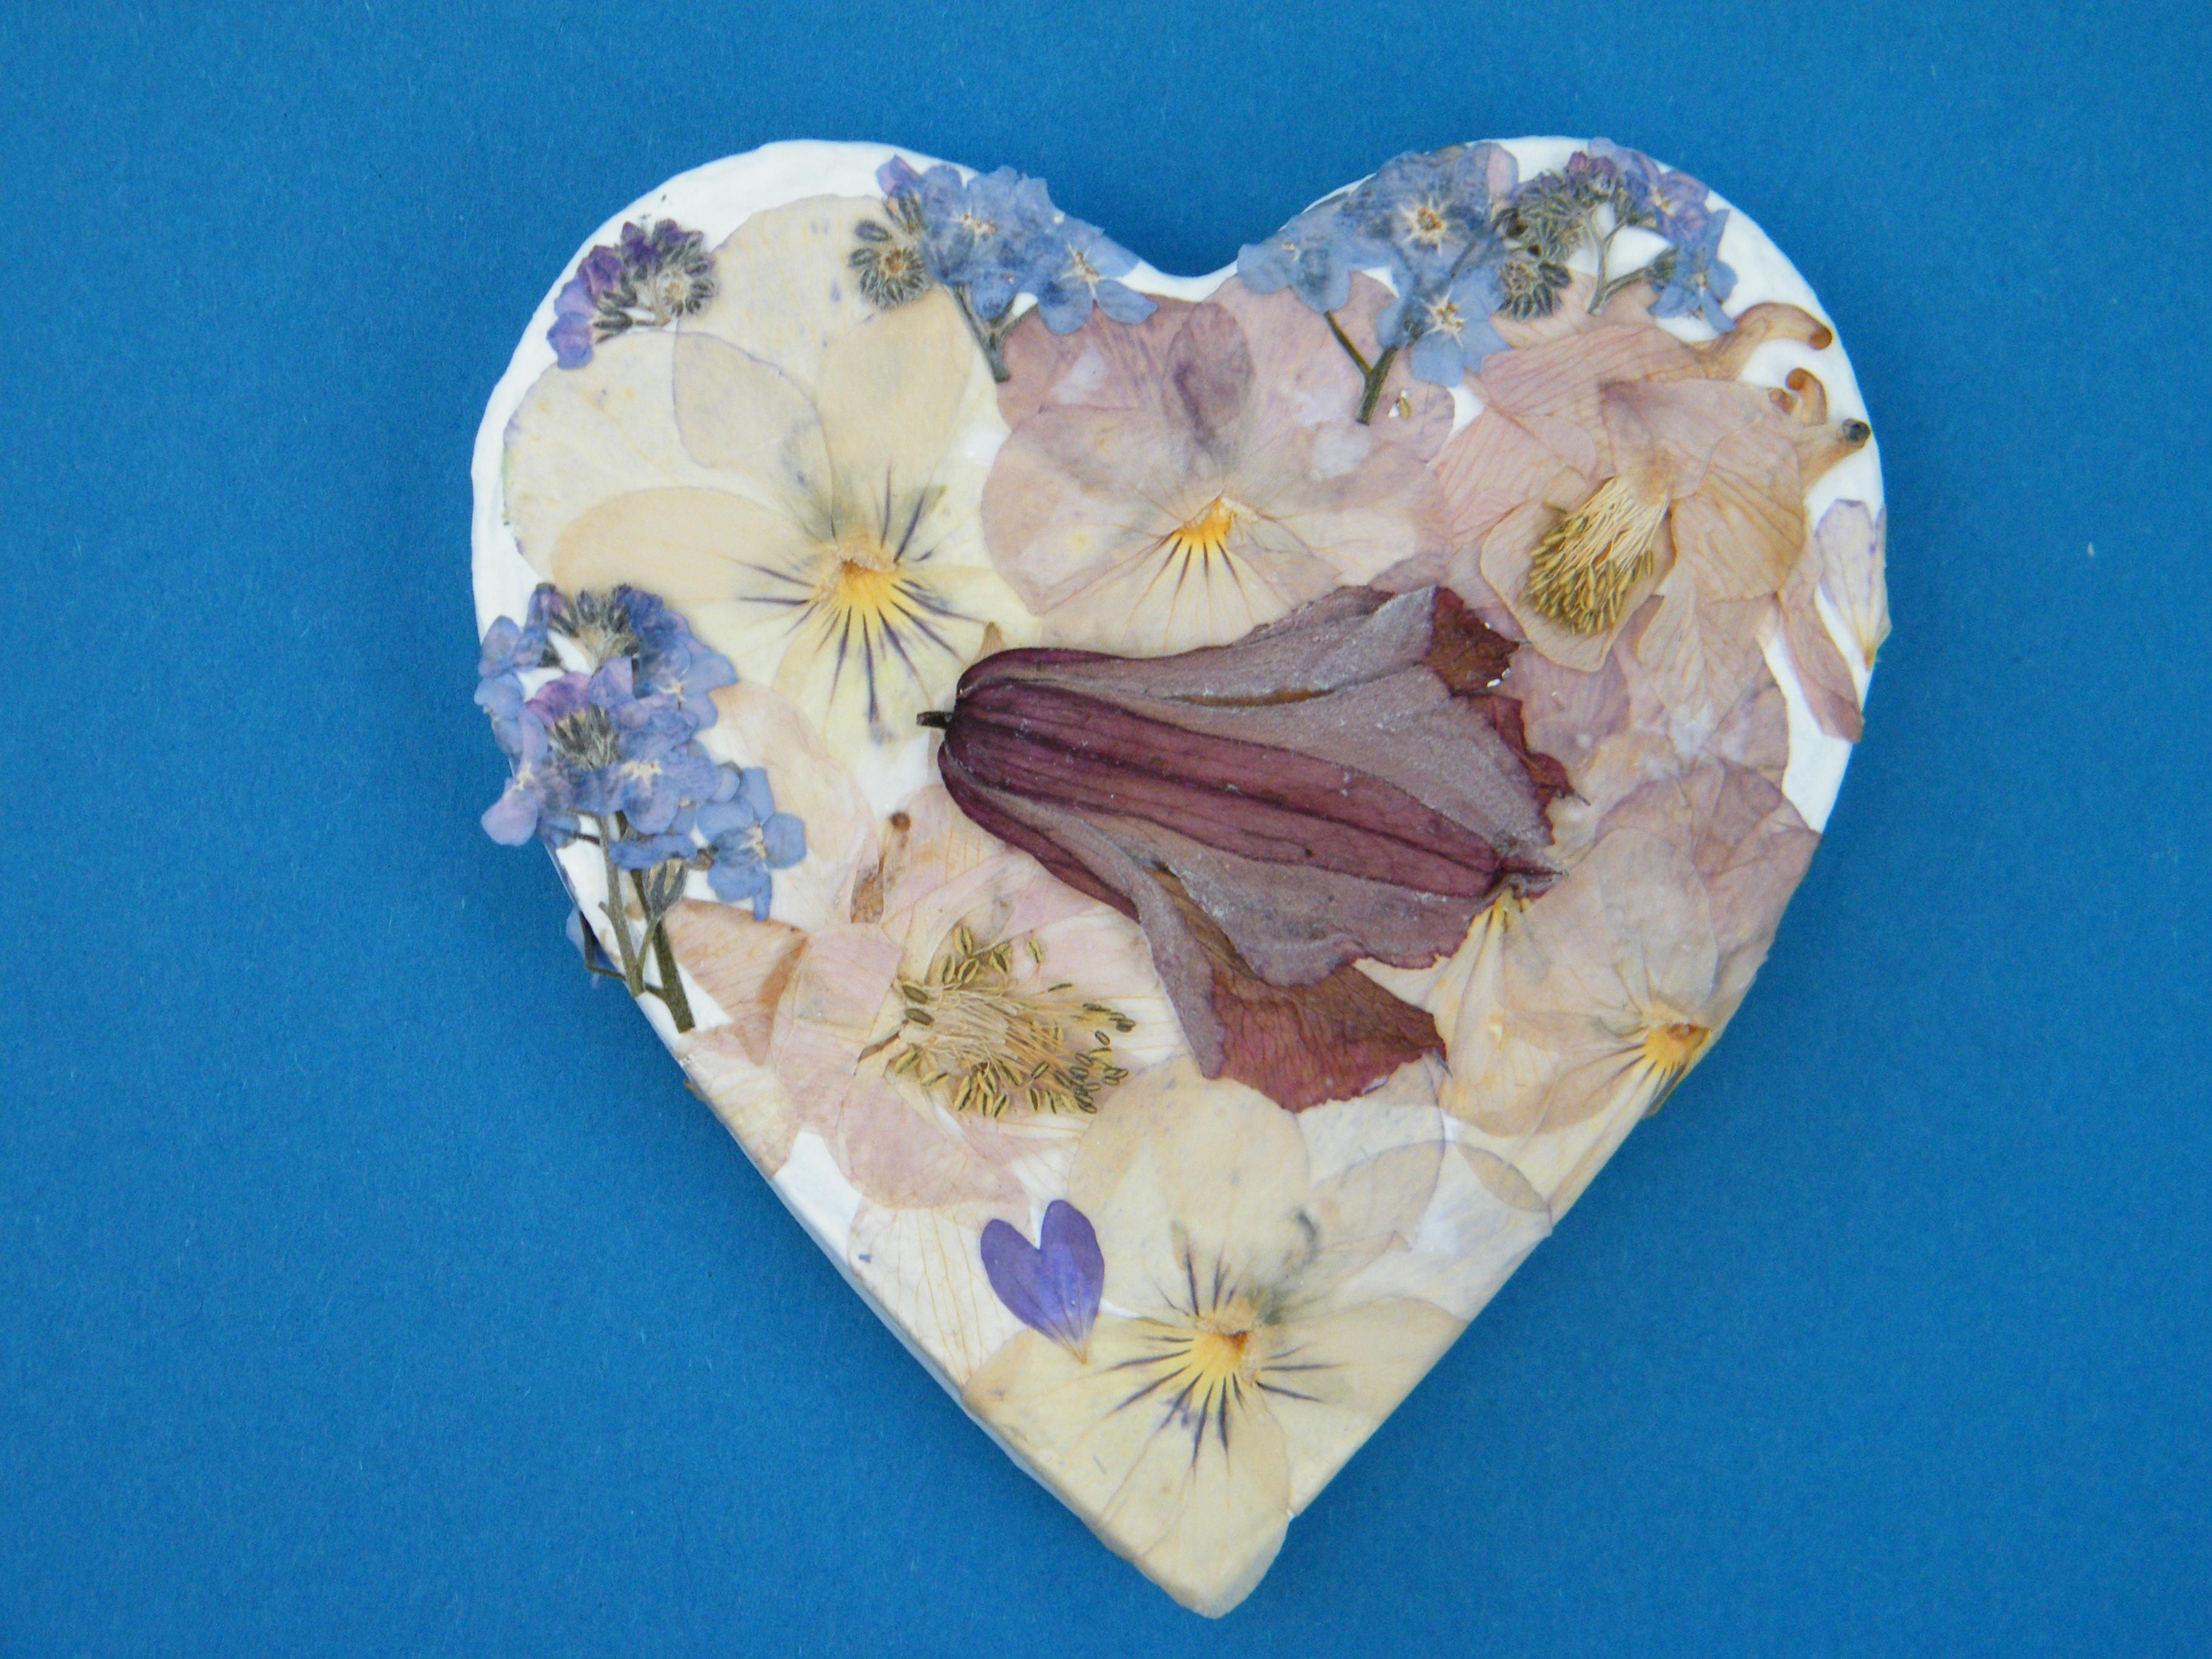 Pressed flower heart box dried flower crafts for Dried flowers for crafts